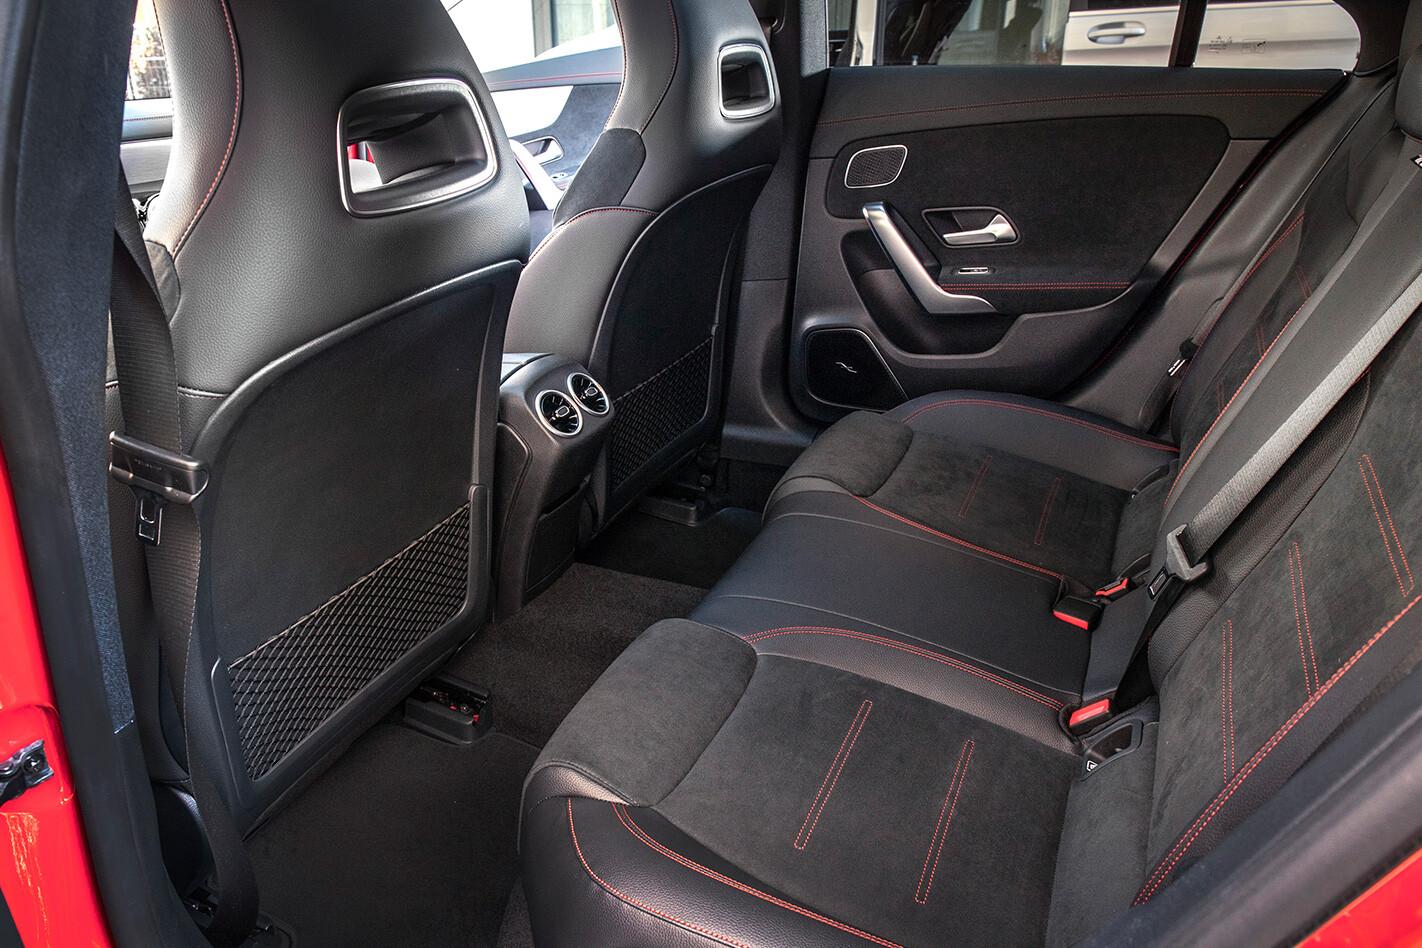 Mercedes Benz Cla Seats Jpg